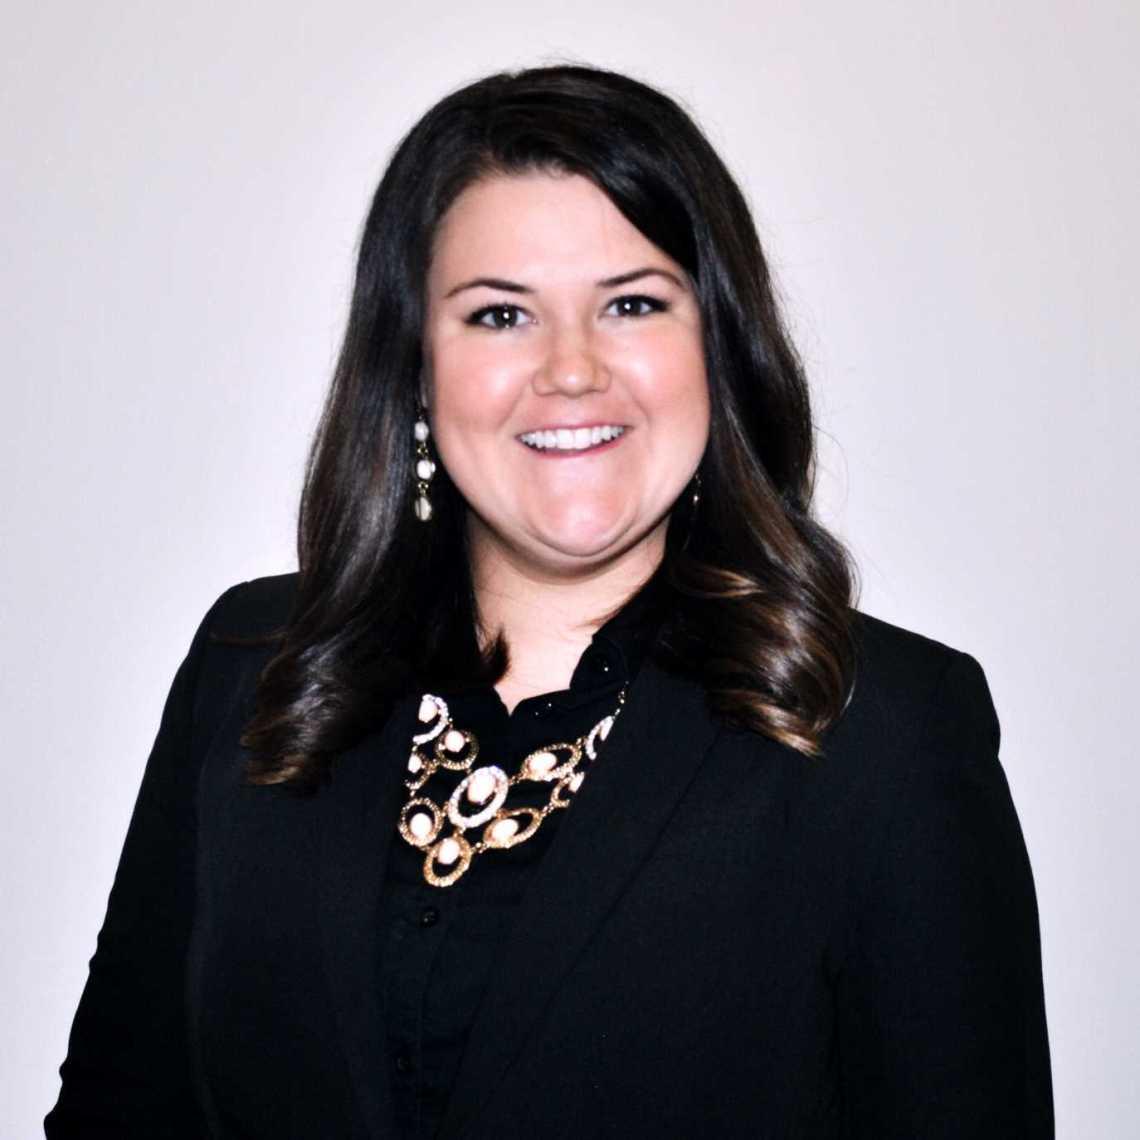 Heather Haun - B.S. - Healthcare Facility Springfield Missouri